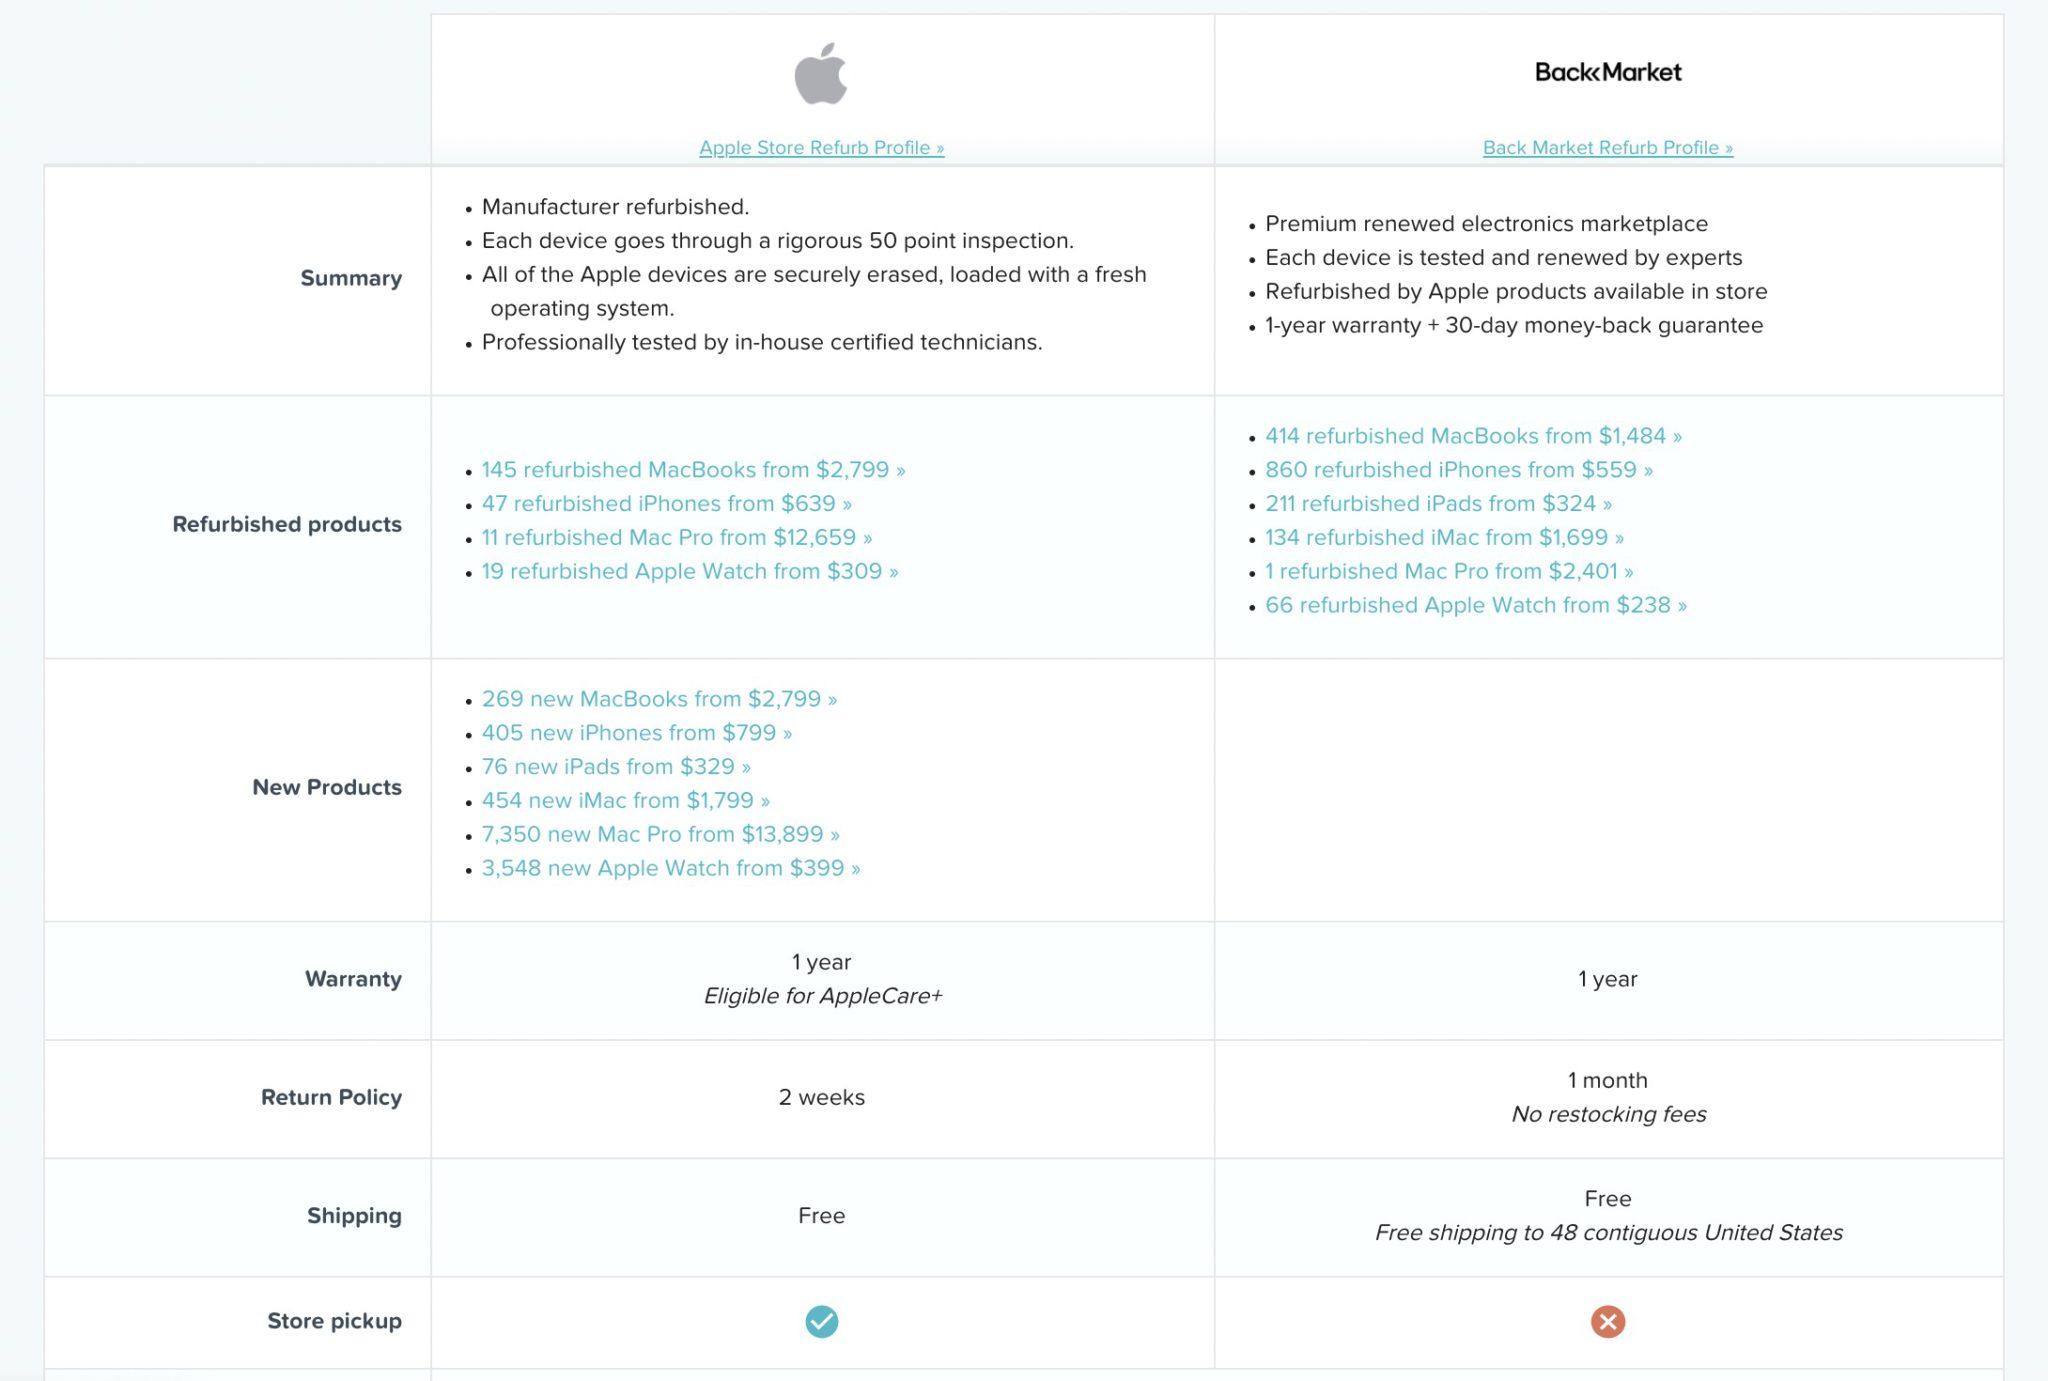 Apple Store vs. Back Market